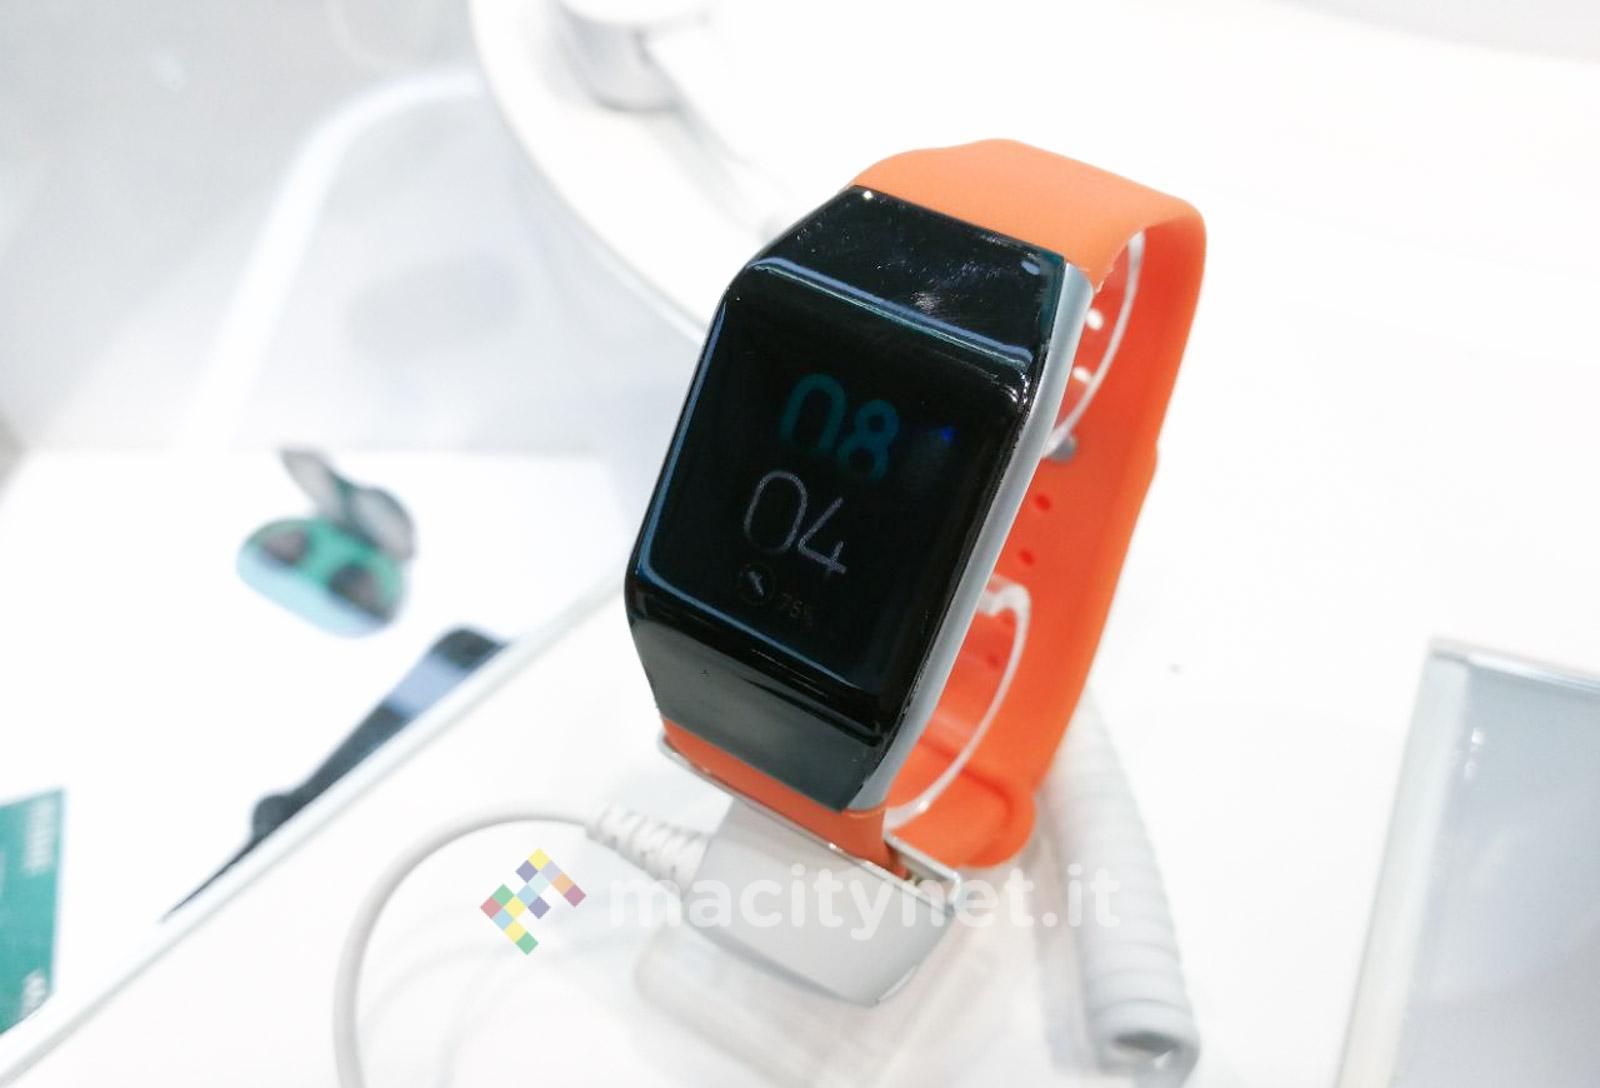 Wiko smartband